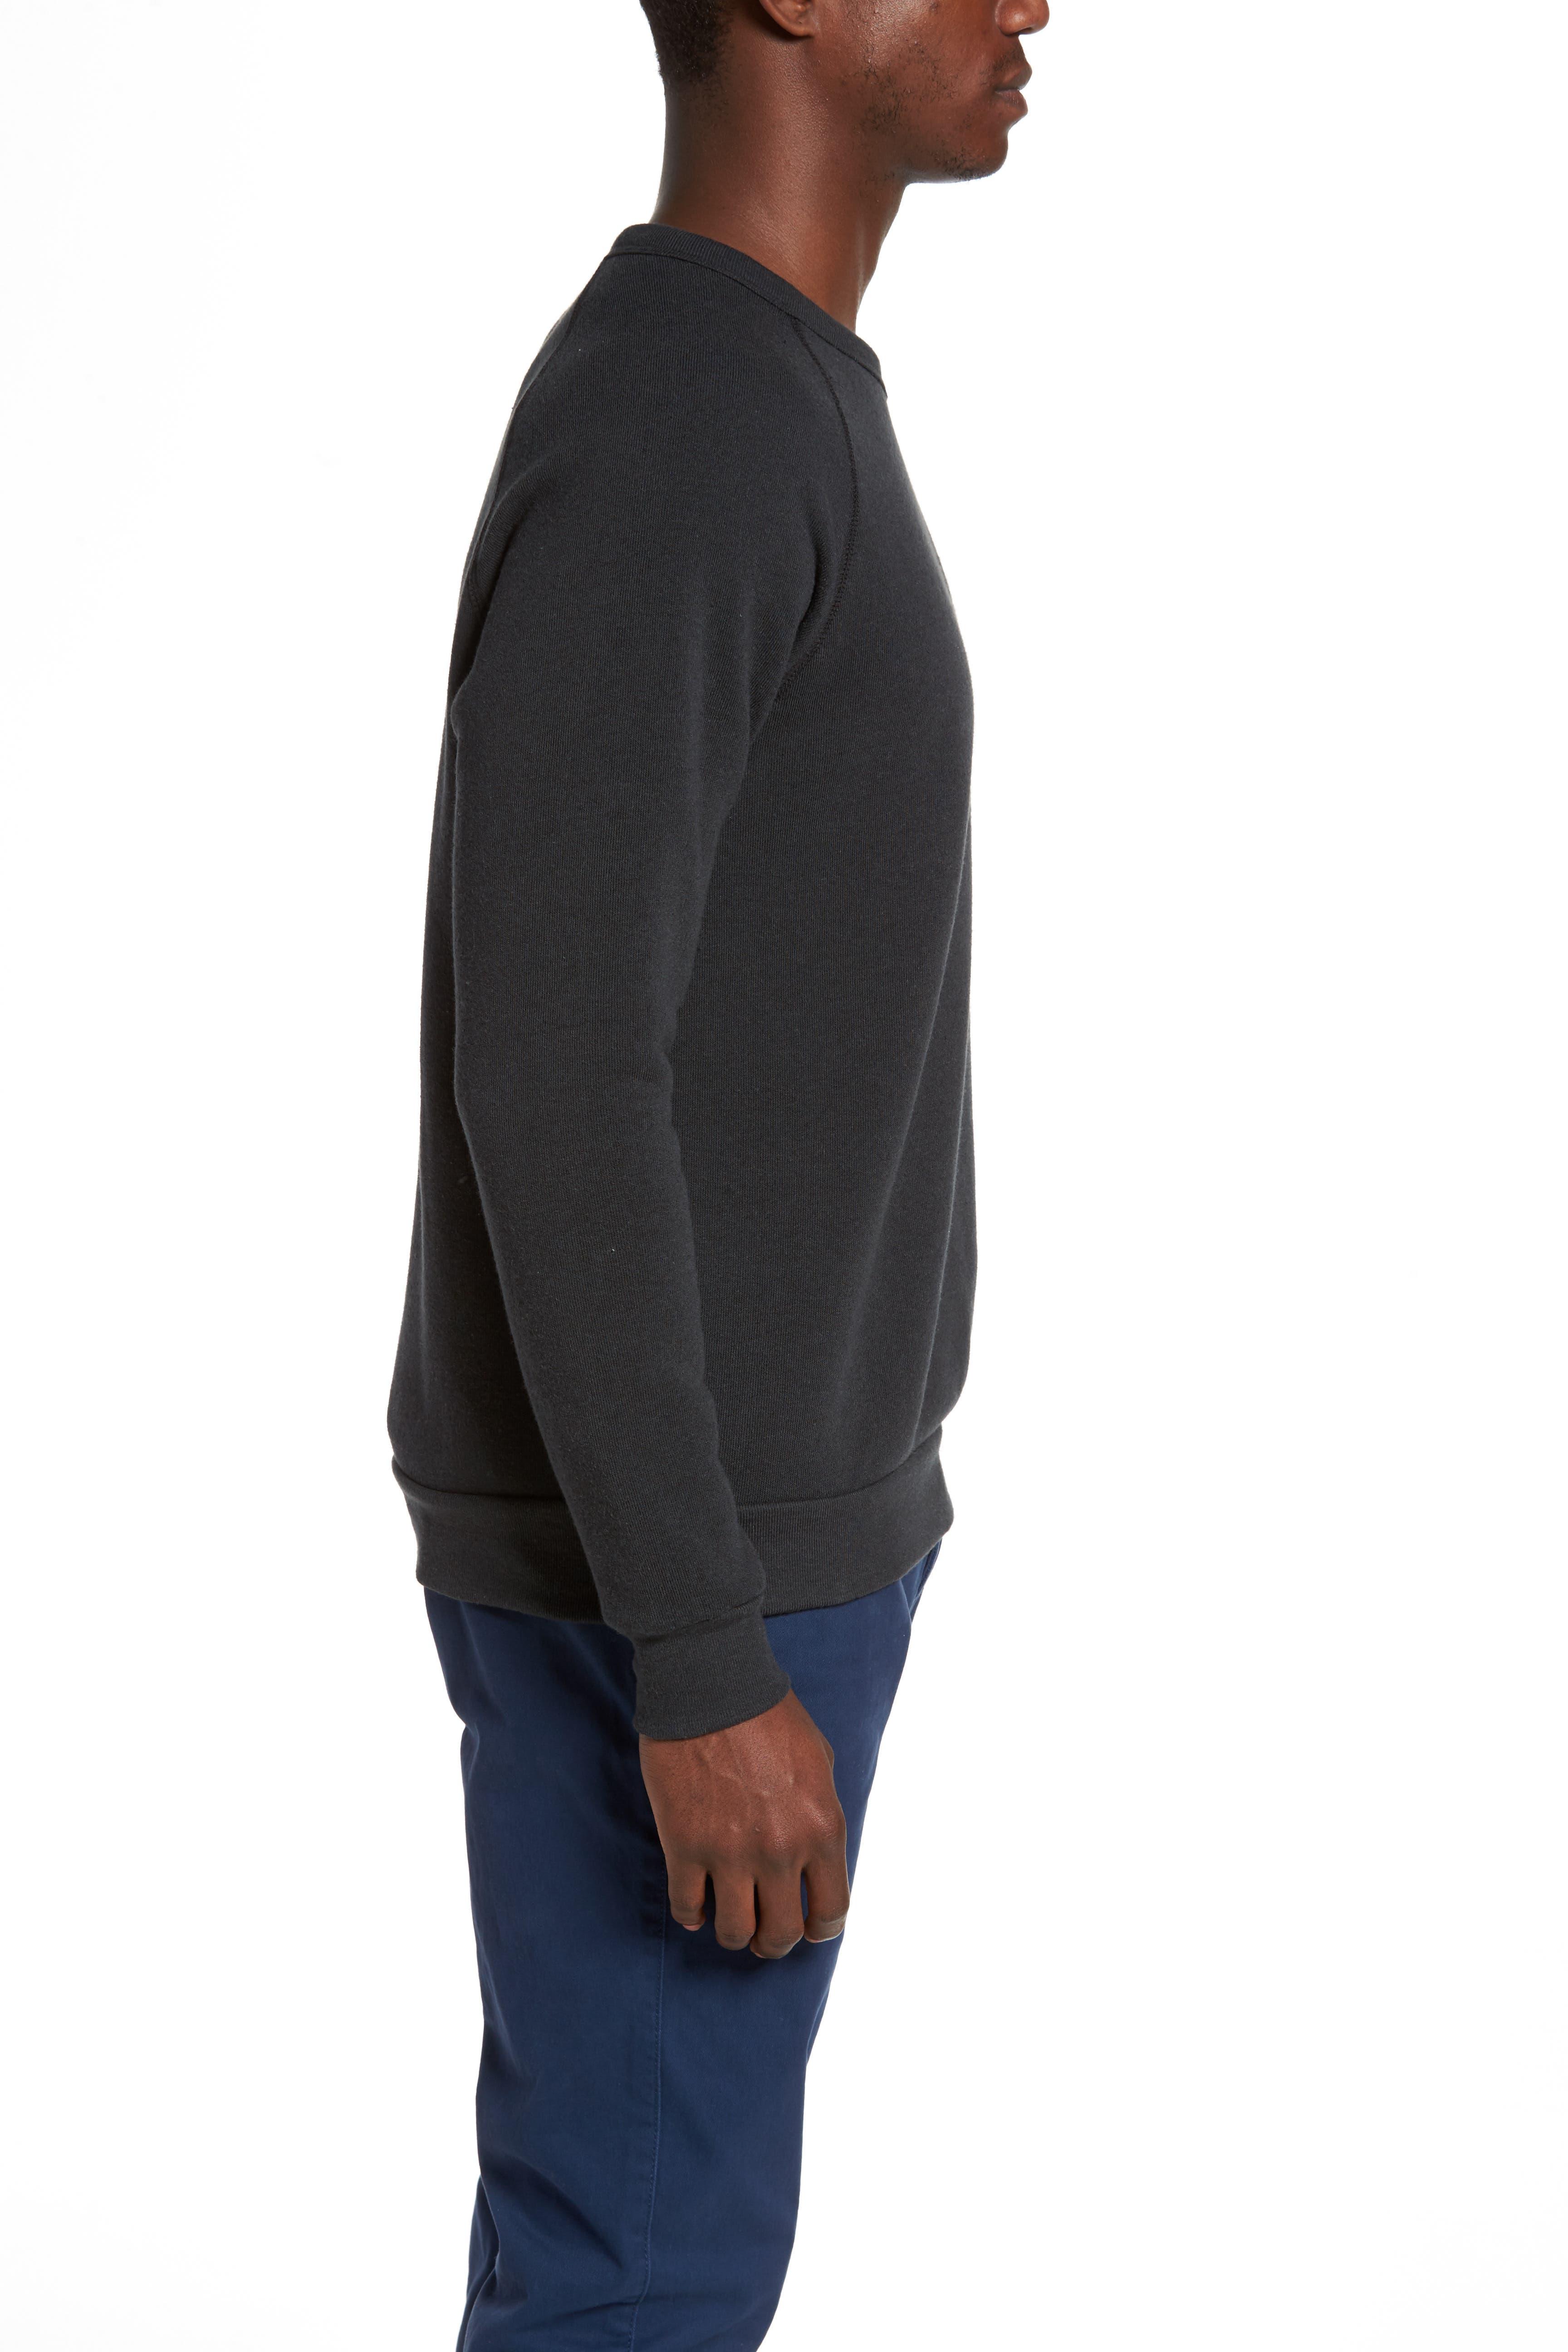 'The Champ' Sweatshirt,                             Alternate thumbnail 35, color,